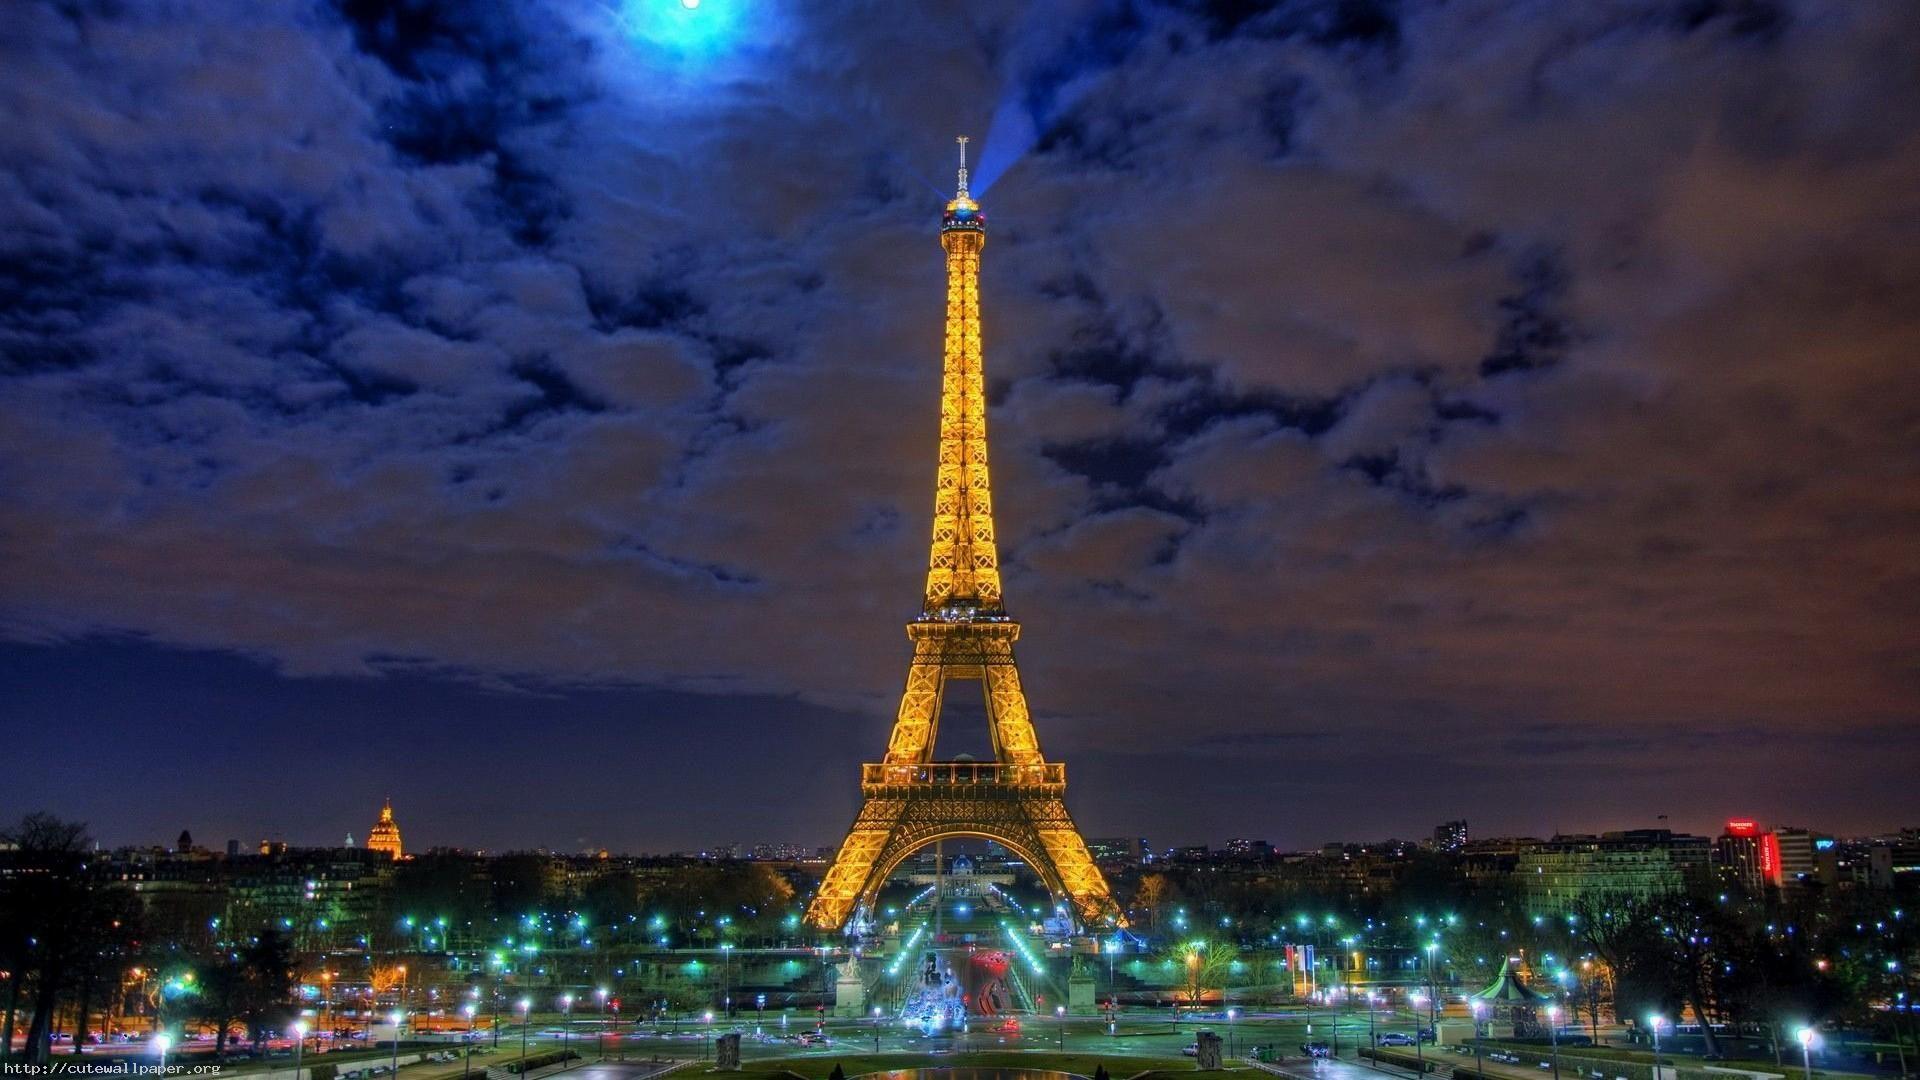 Обои Эйфелева башня, Облака, вид, лодки, красиво. Города foto 14